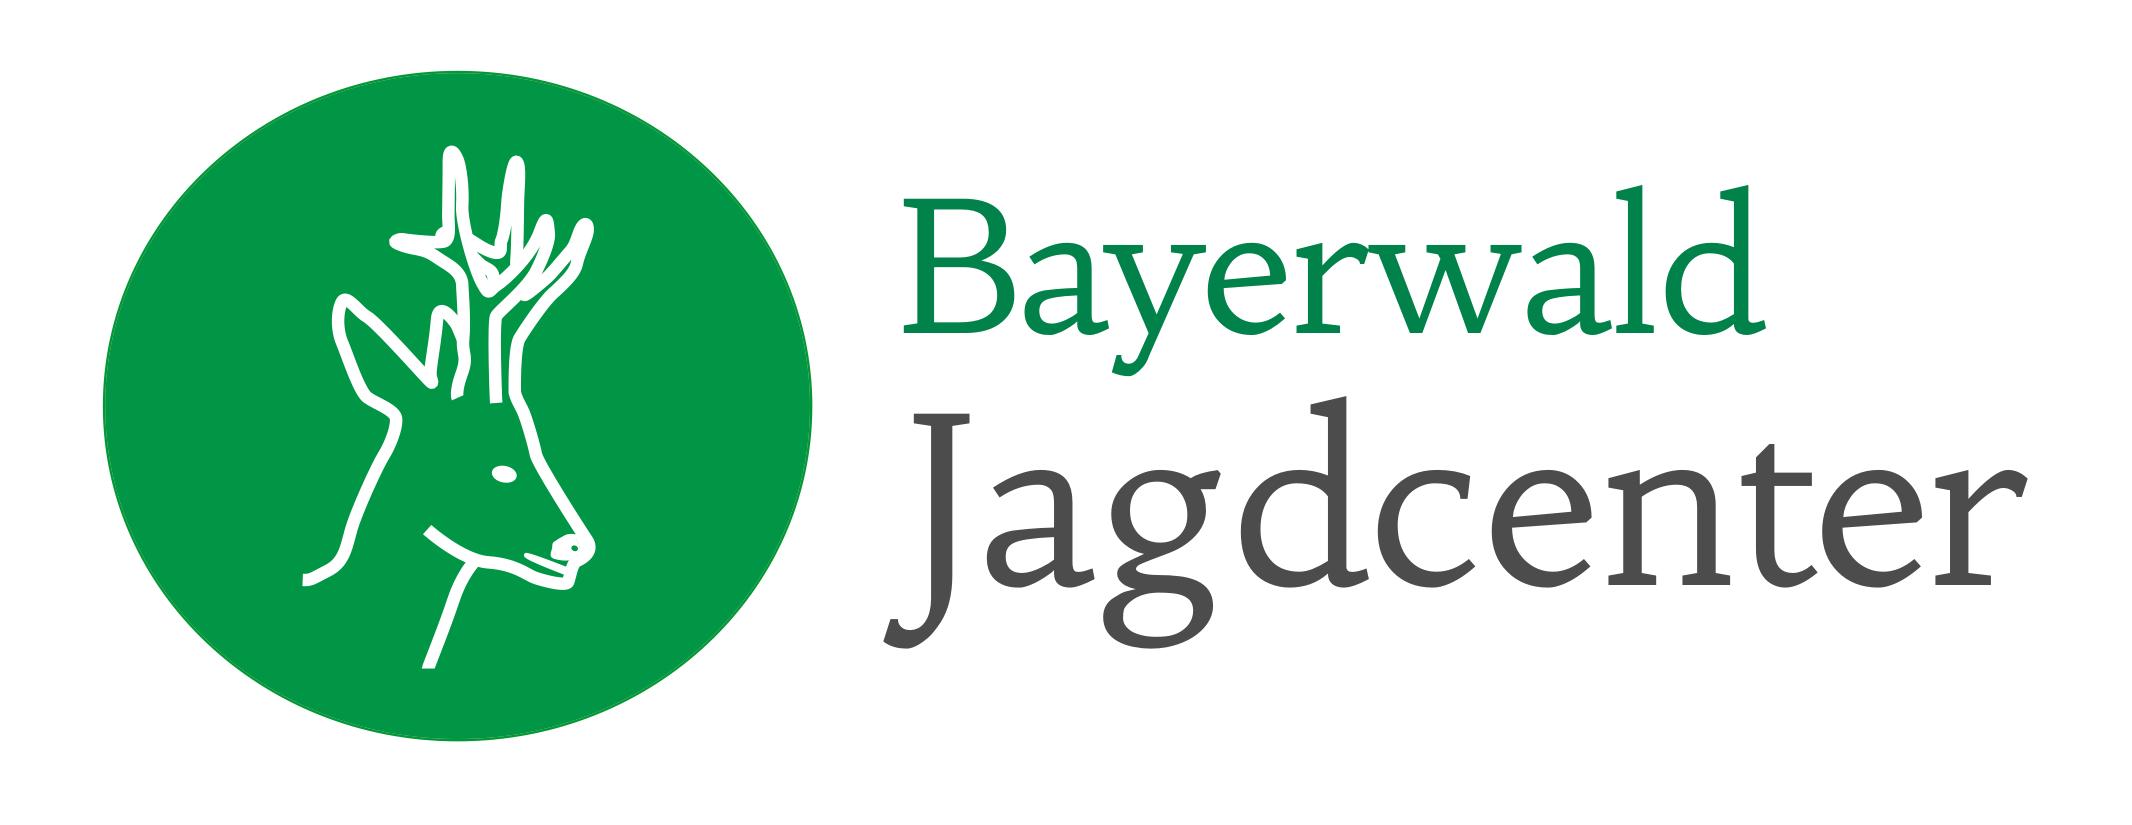 Bayerwald Jagdcenter